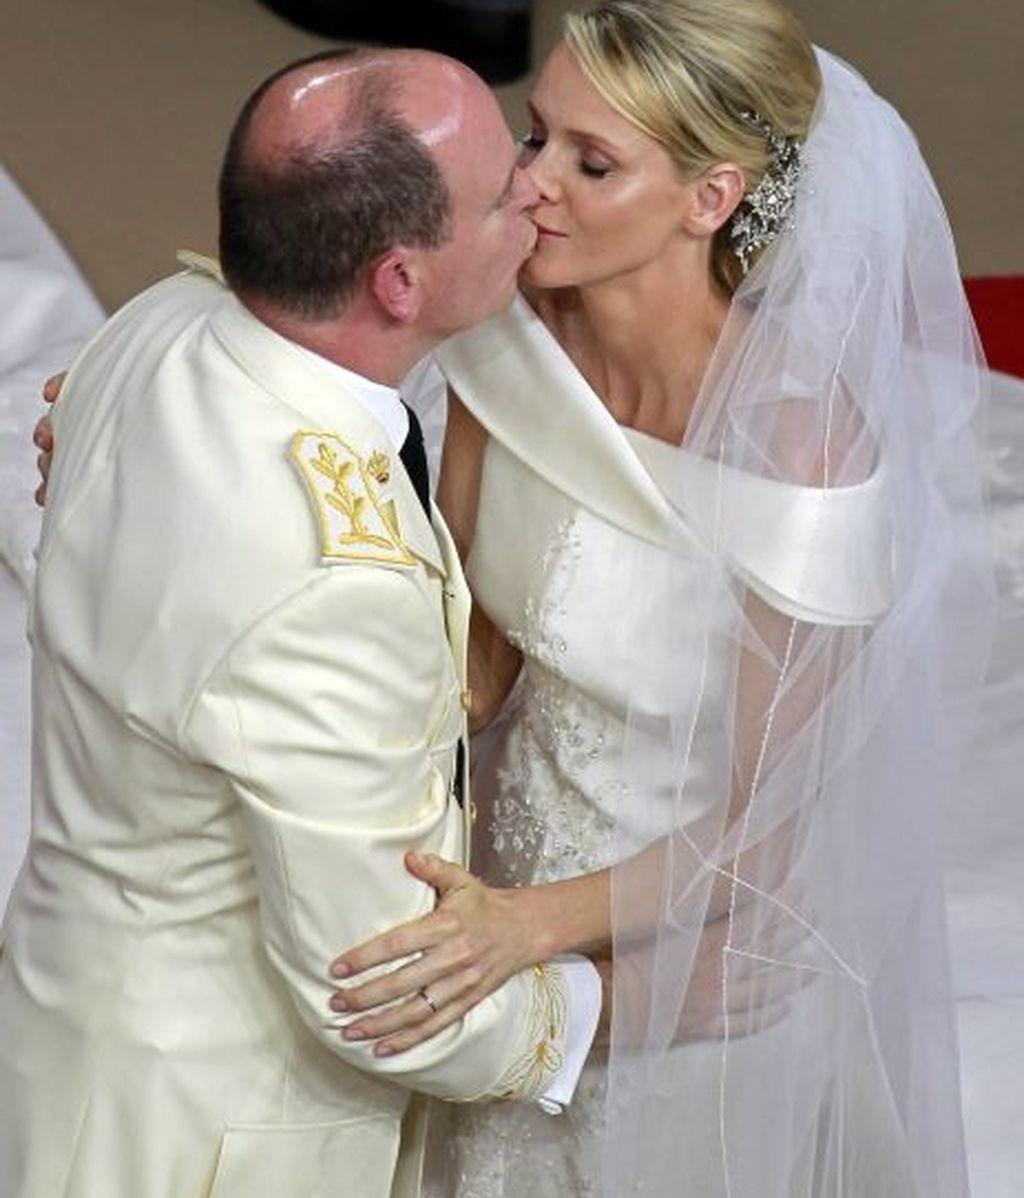 Alberto y Charlene se besan, ya convertidos en marido y mujer